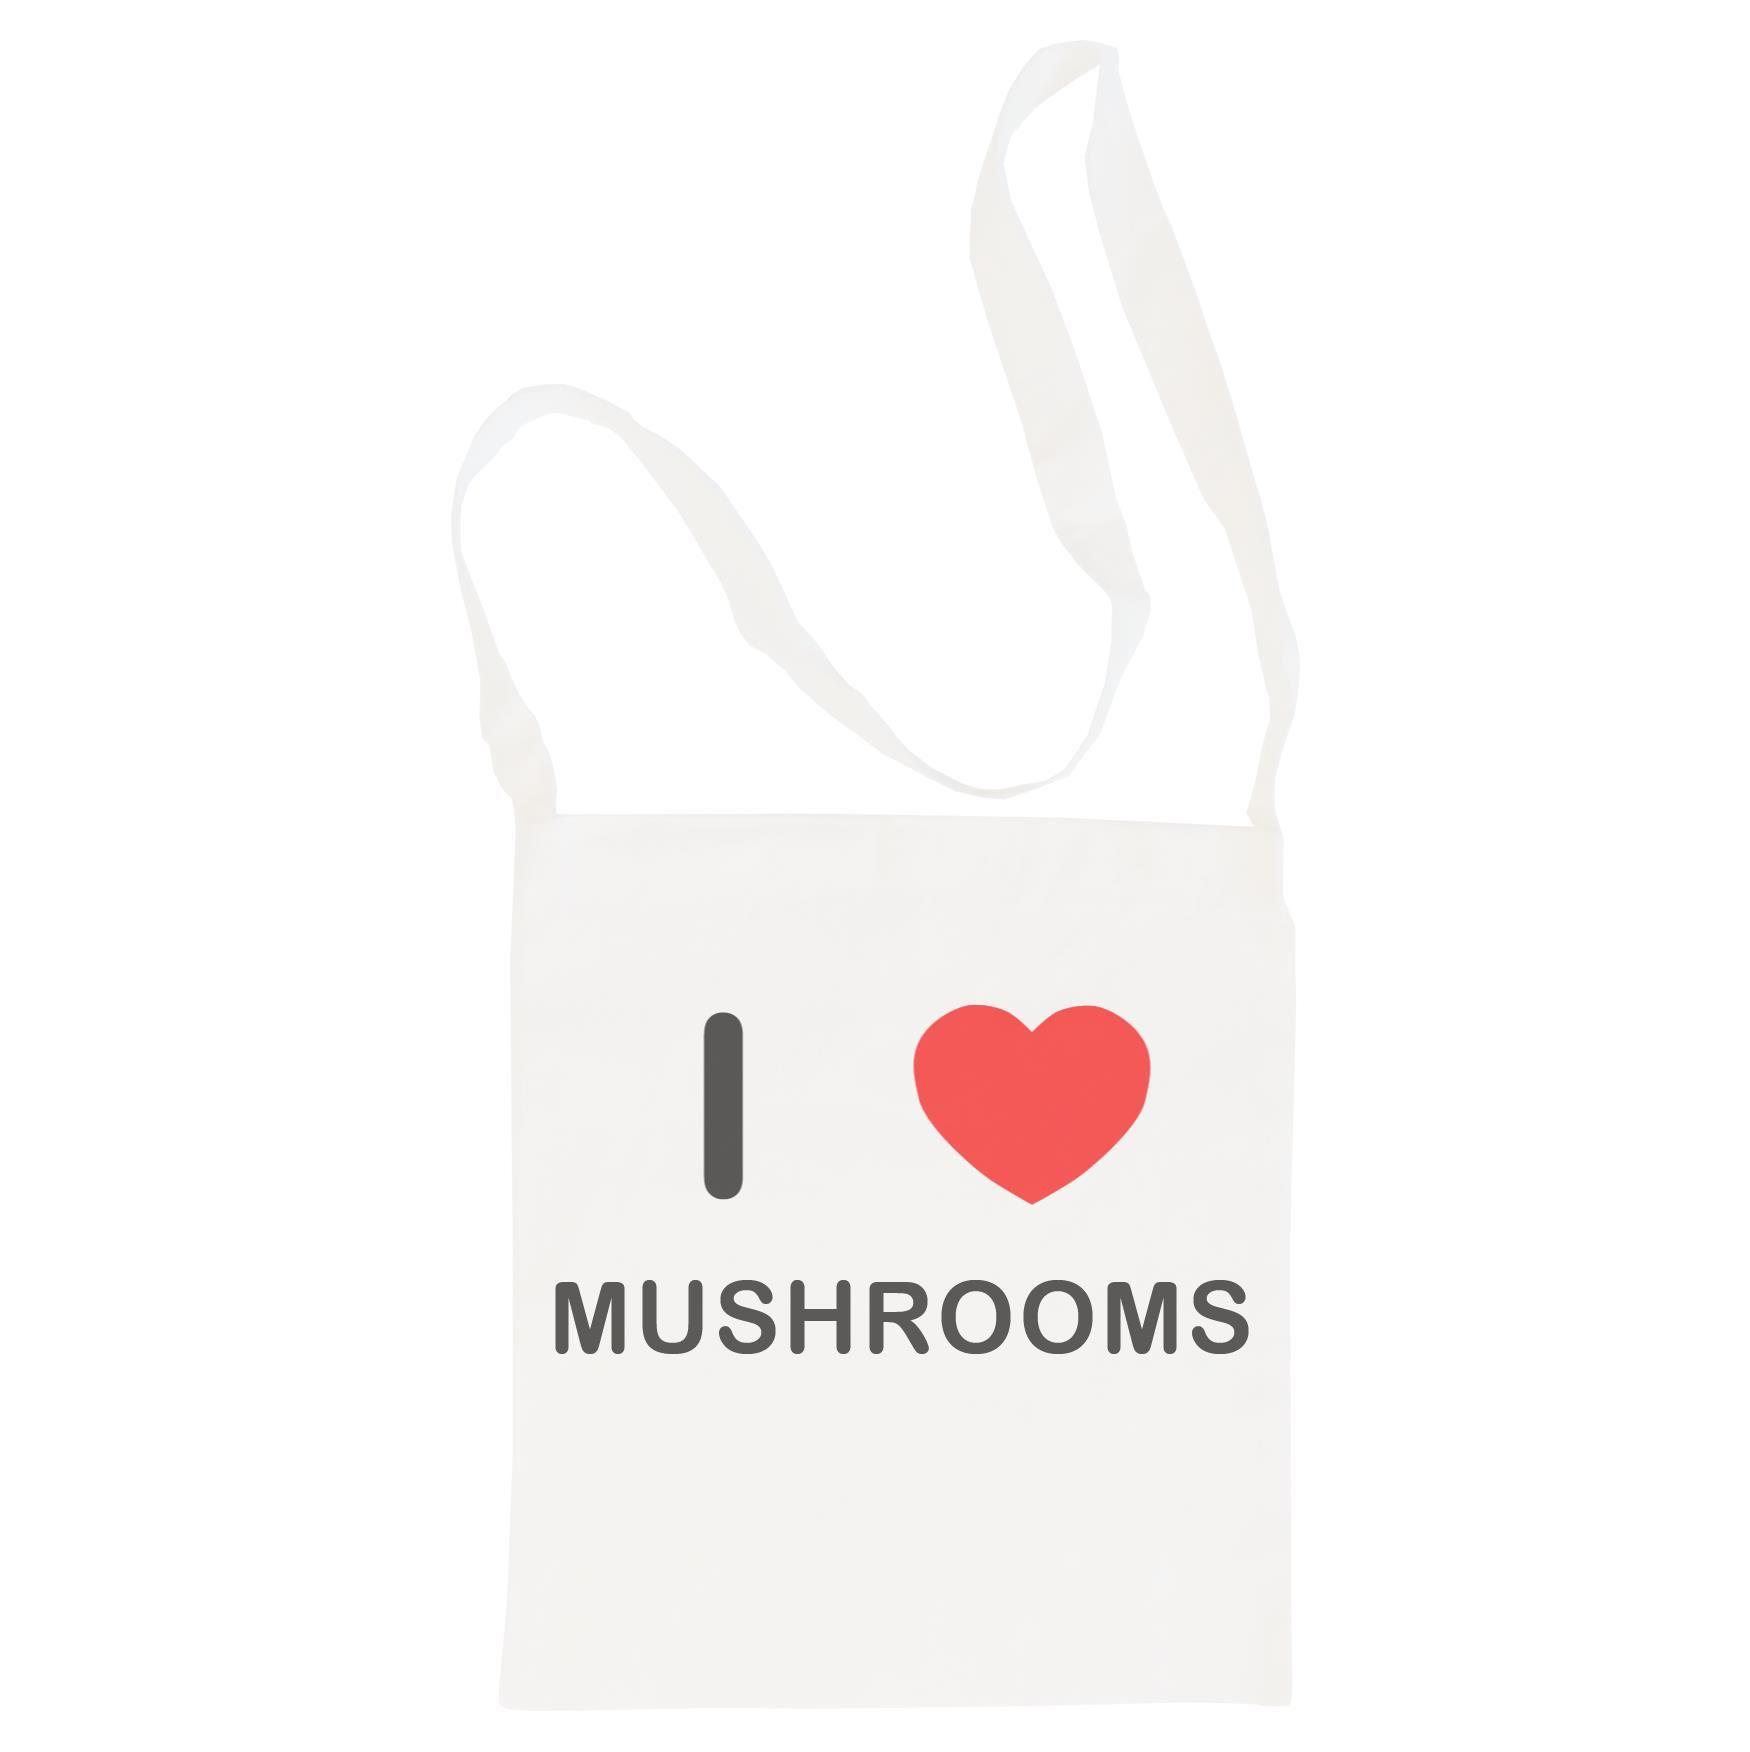 I Love Mushrooms - Cotton Bag | Size choice Tote, Shopper or Sling